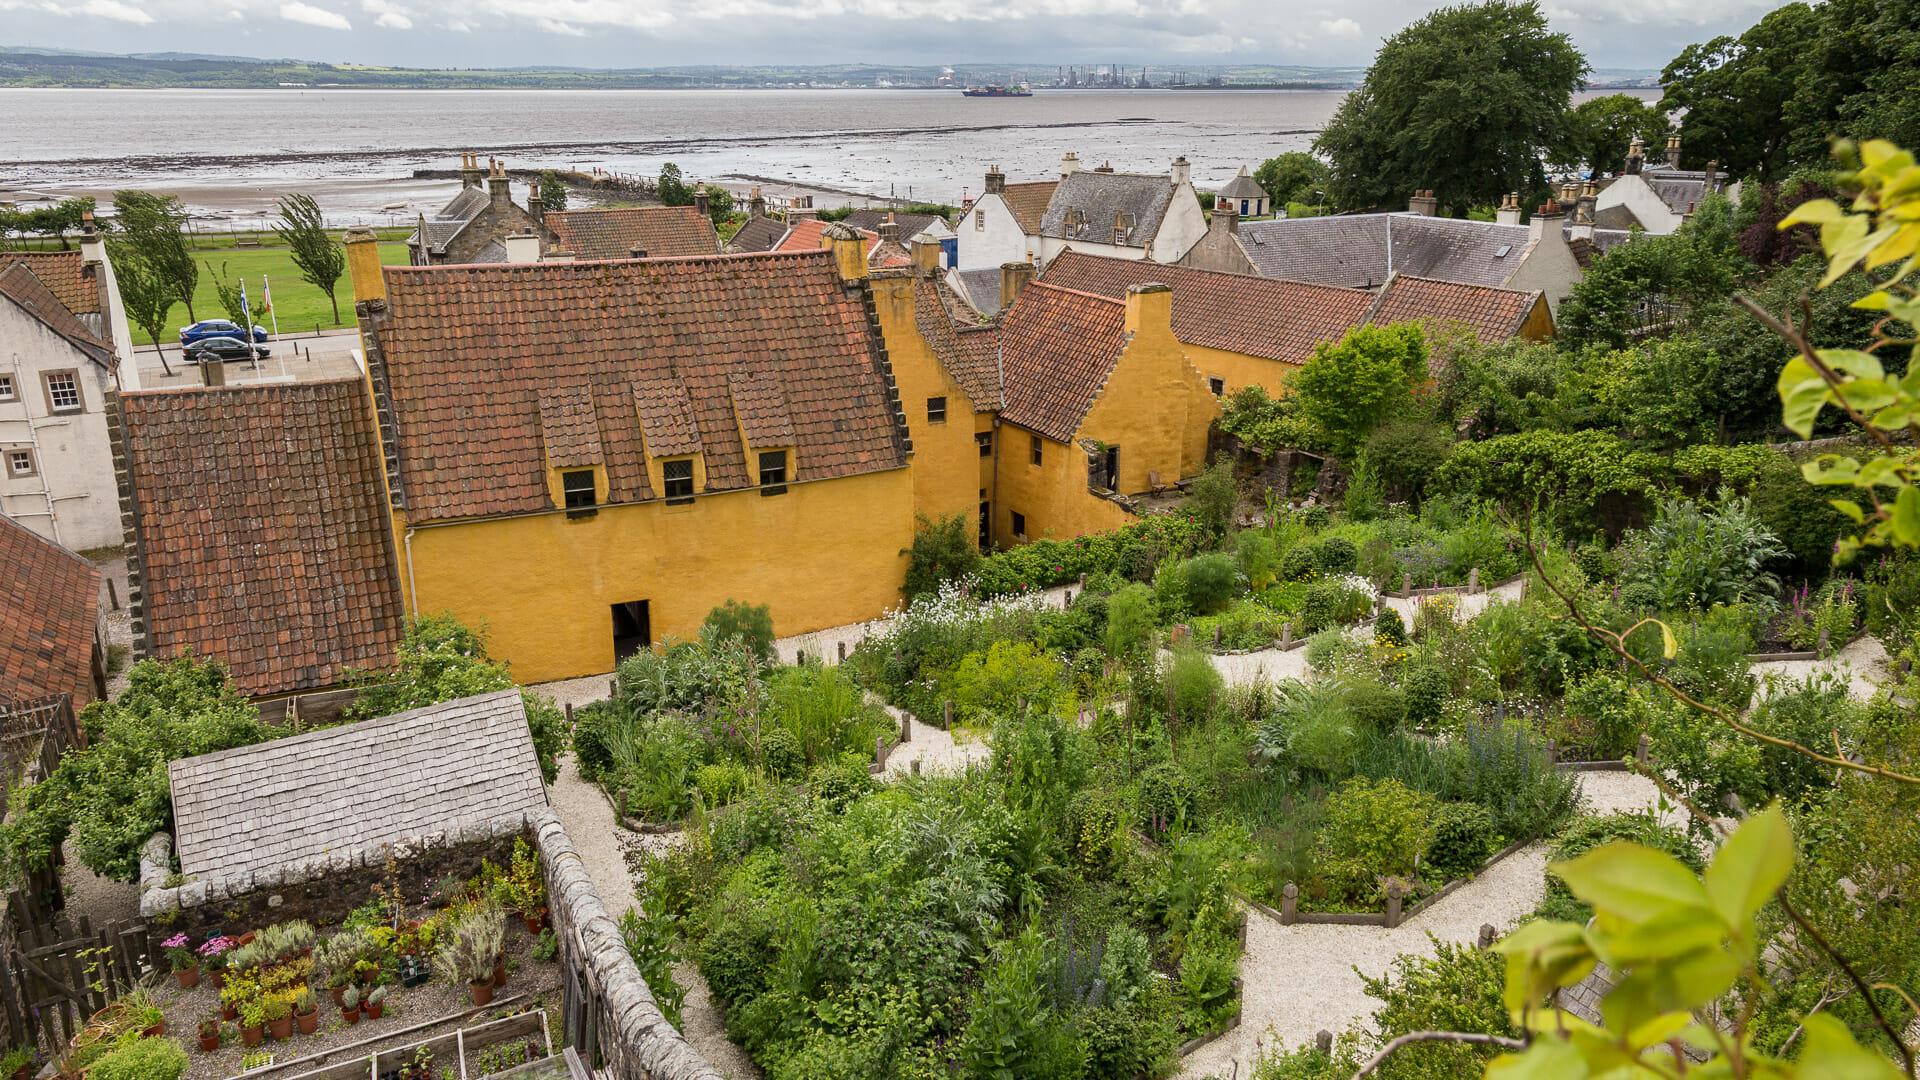 Die ummauerten Gärten des Culross Palace